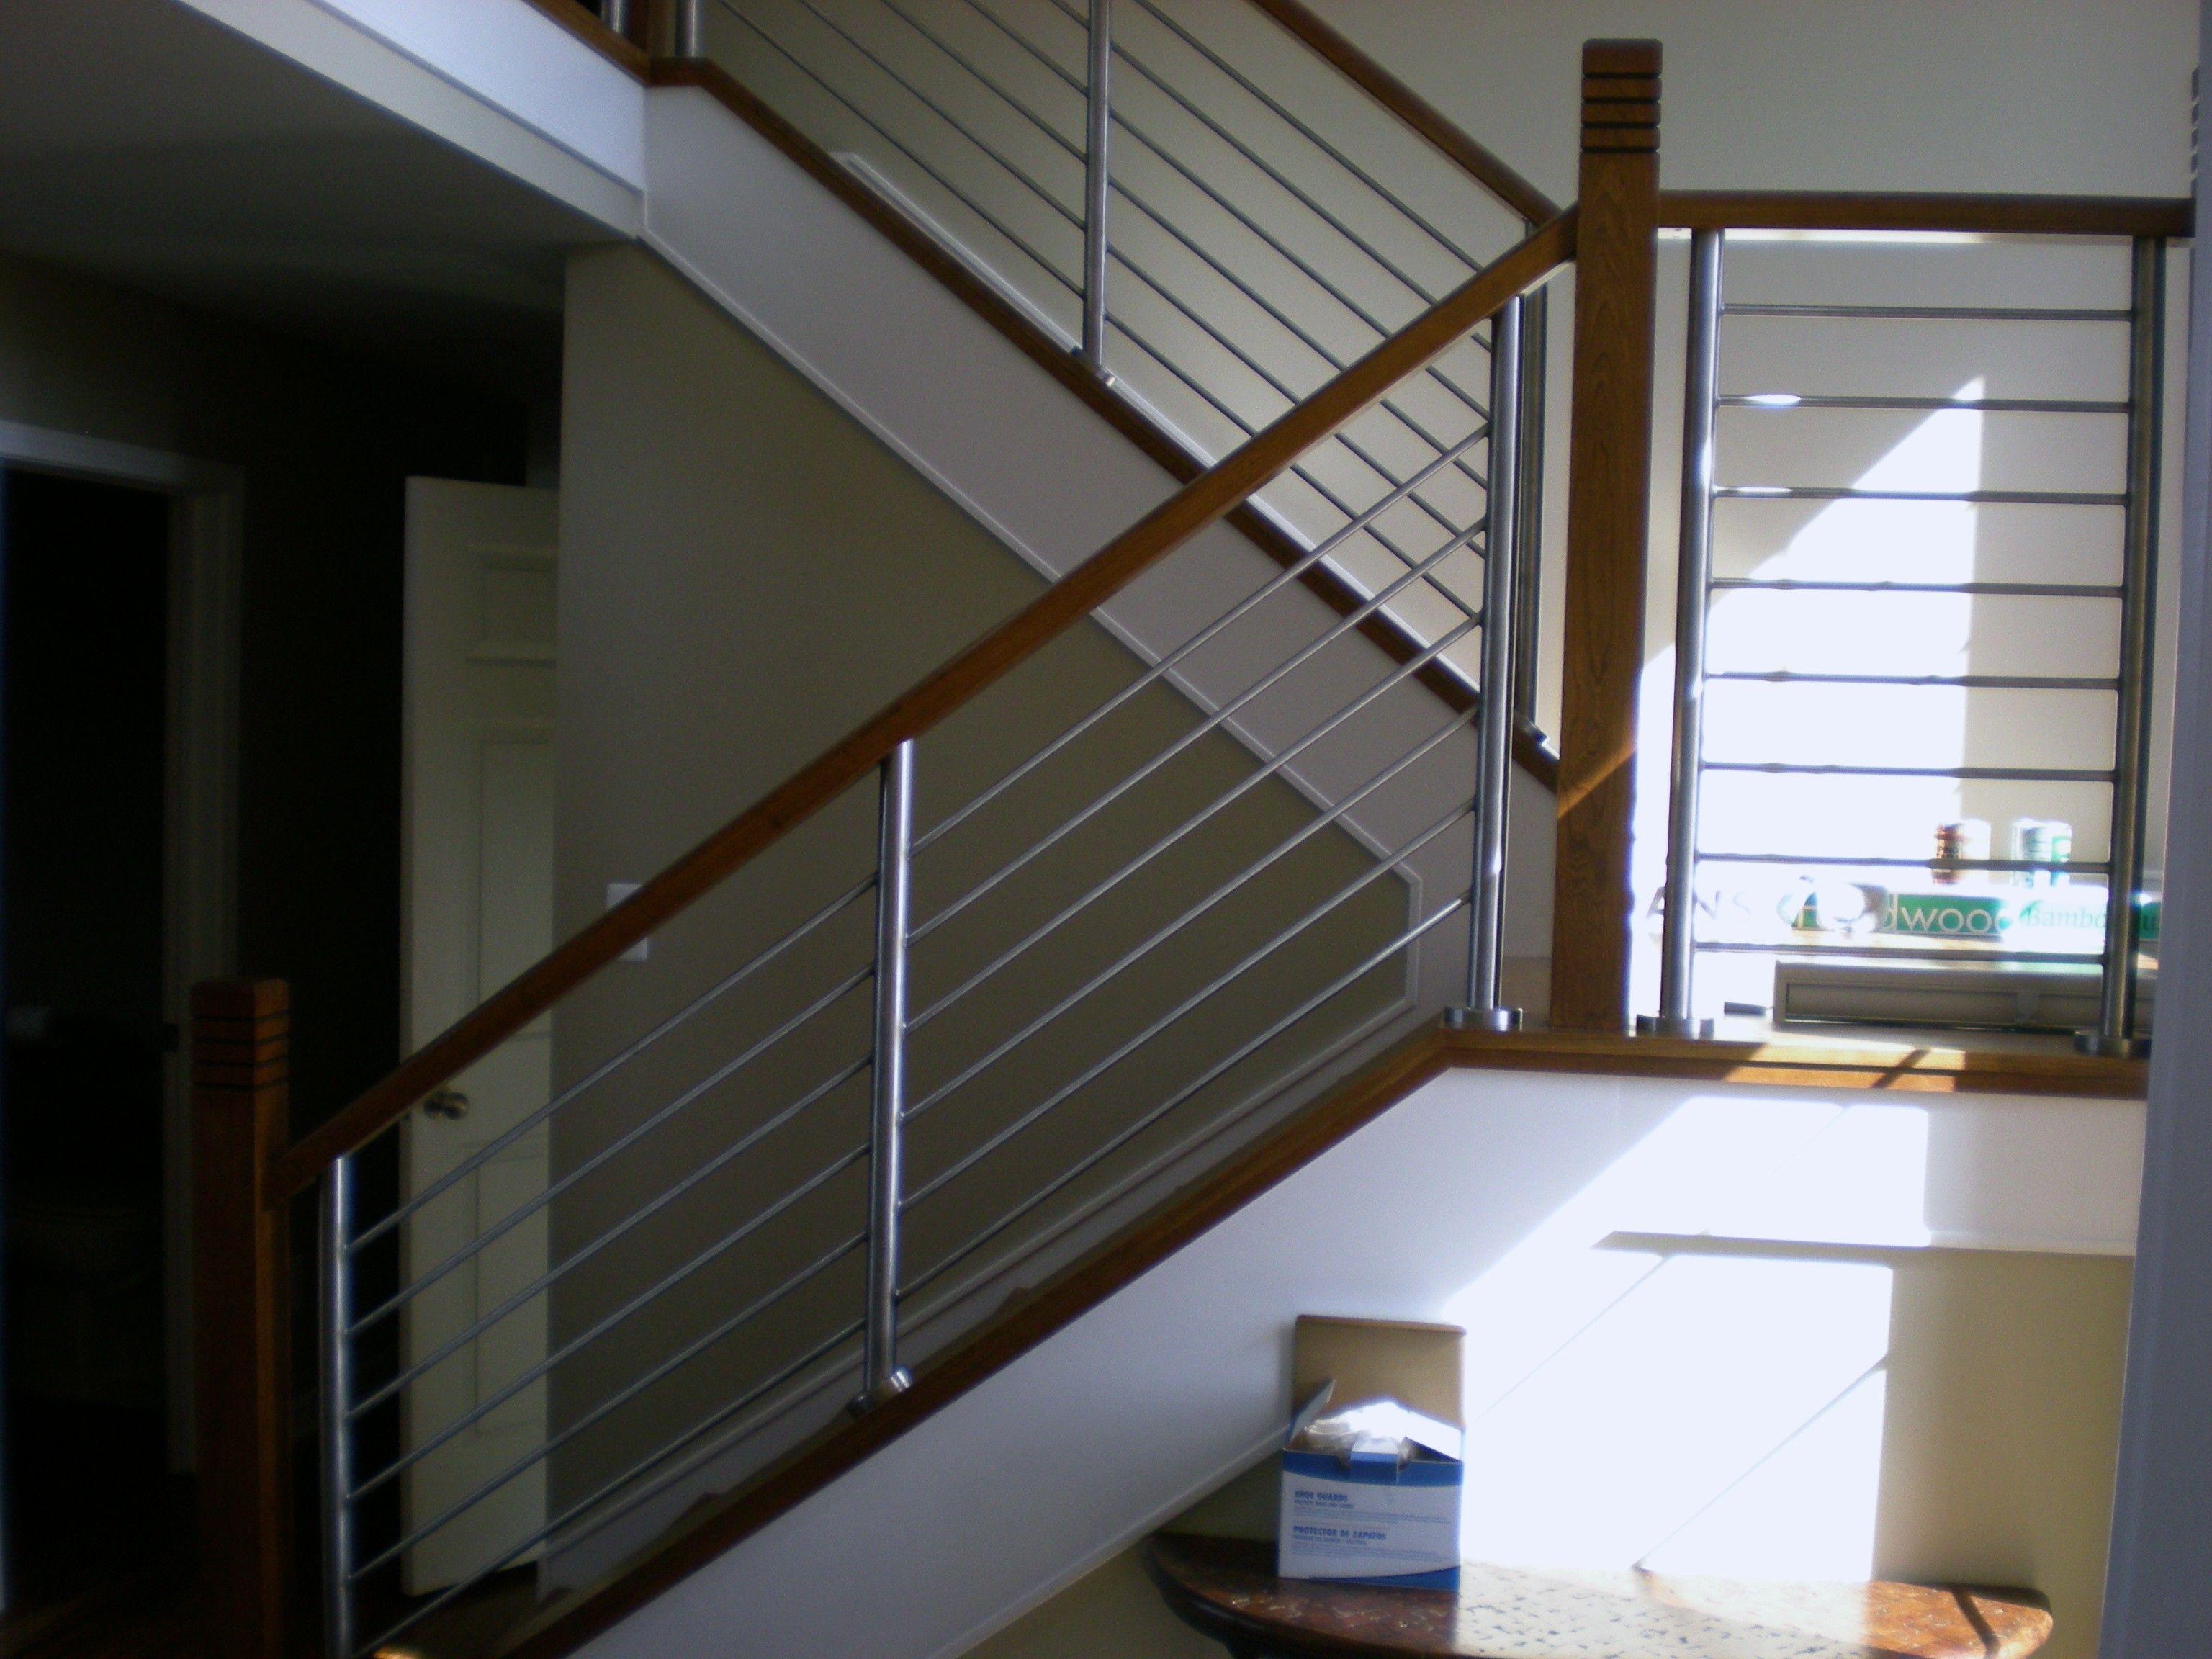 Best Pin By David On Stairs Steel Stair Railing Steel 400 x 300